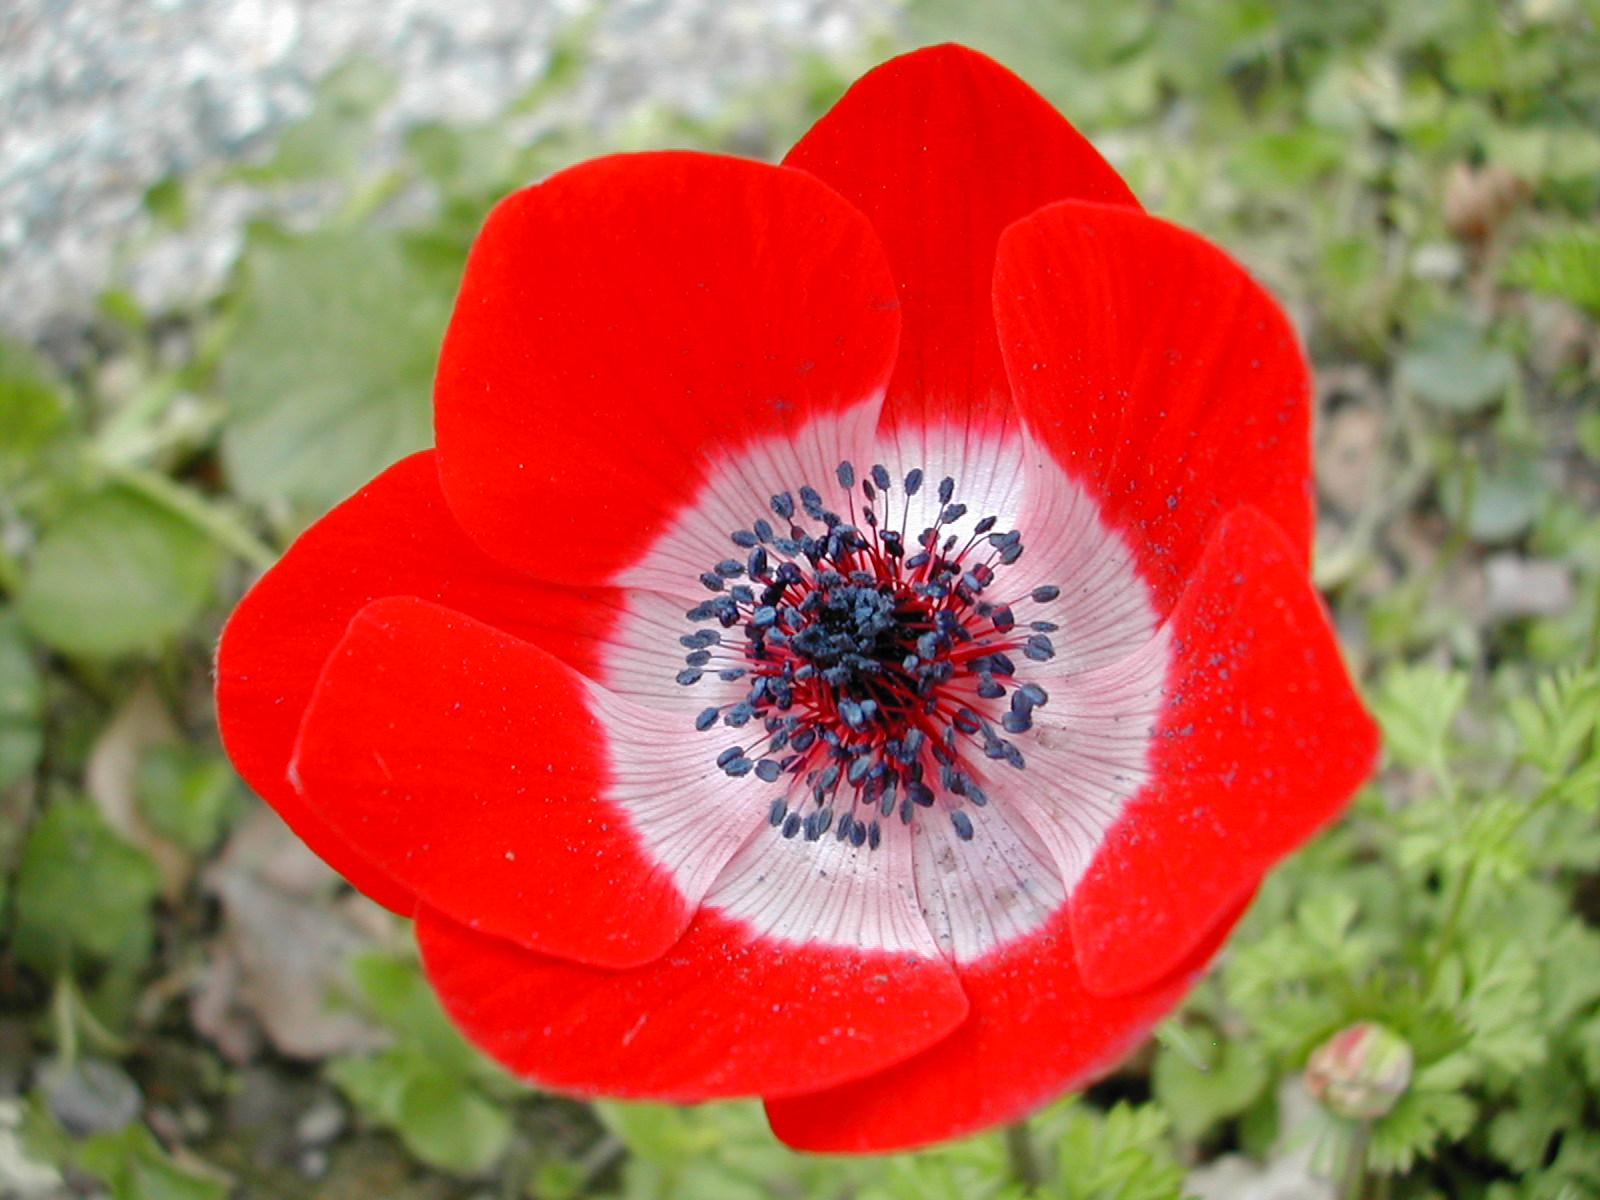 Sfondi gratis desktop fiori sfondi fiori for Sfondi desktop fiori